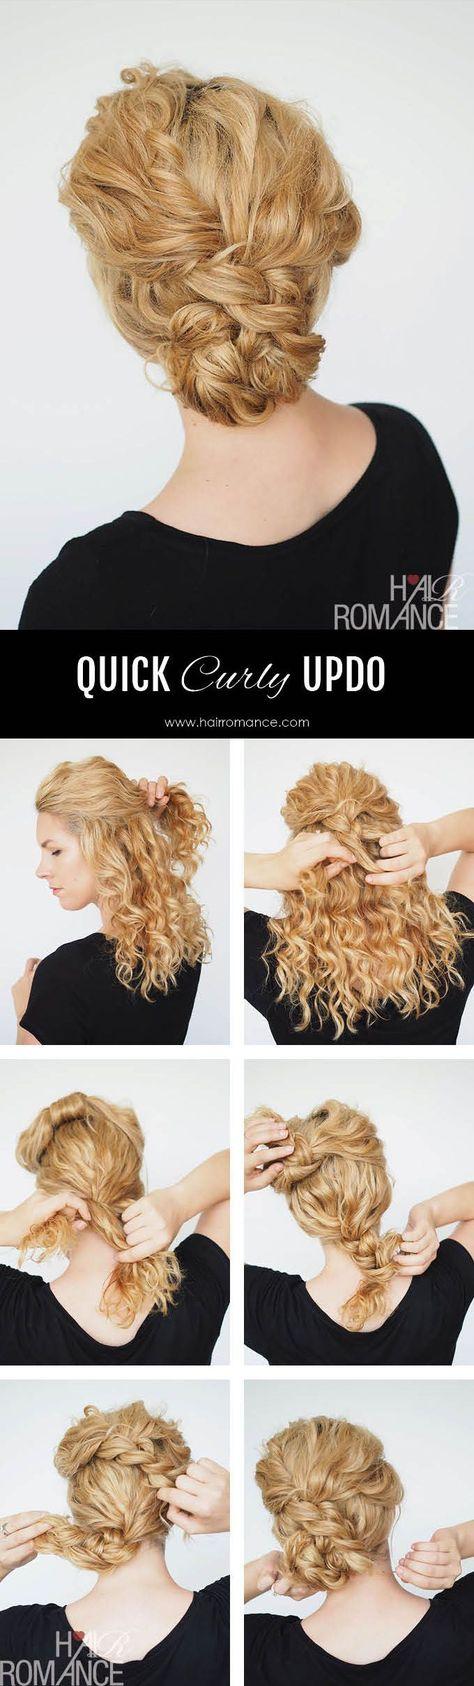 2 min updo for curly hair   Hair Romance   Bloglovin'